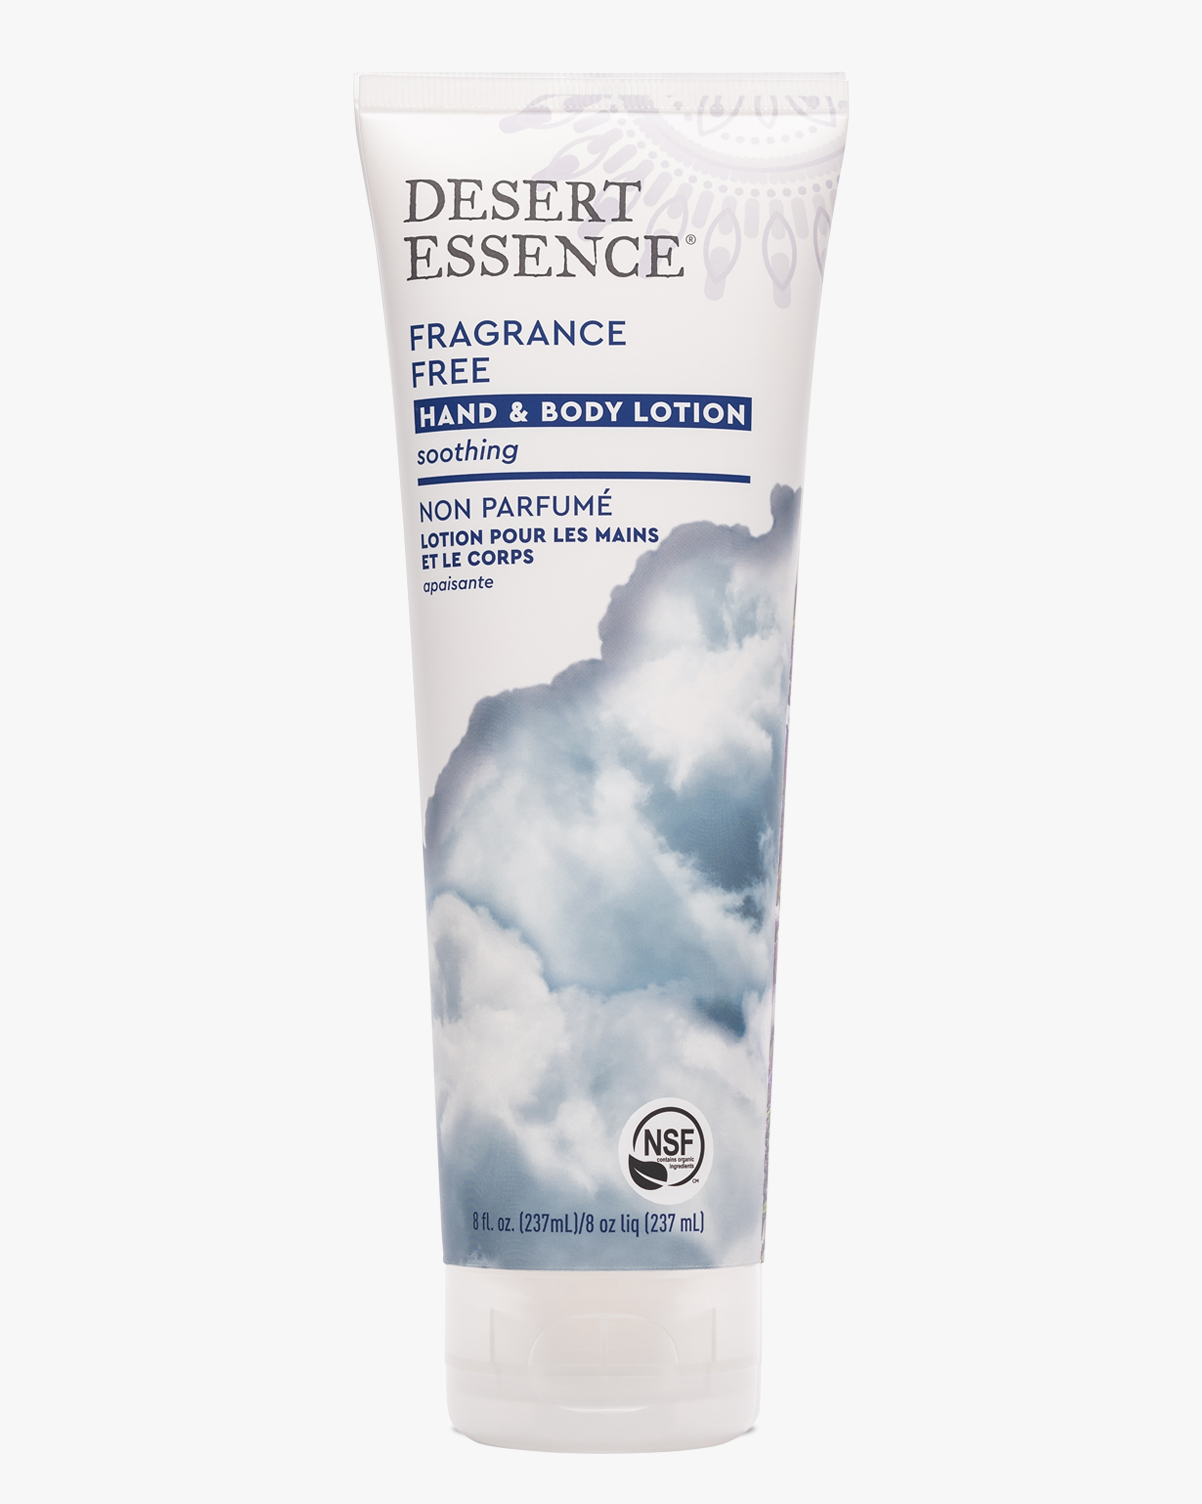 Desert Essence coupon: Desert Essence Fragrance Free Hand and Body Lotion, 8 fl. oz. | Vegan | Gluten-Free